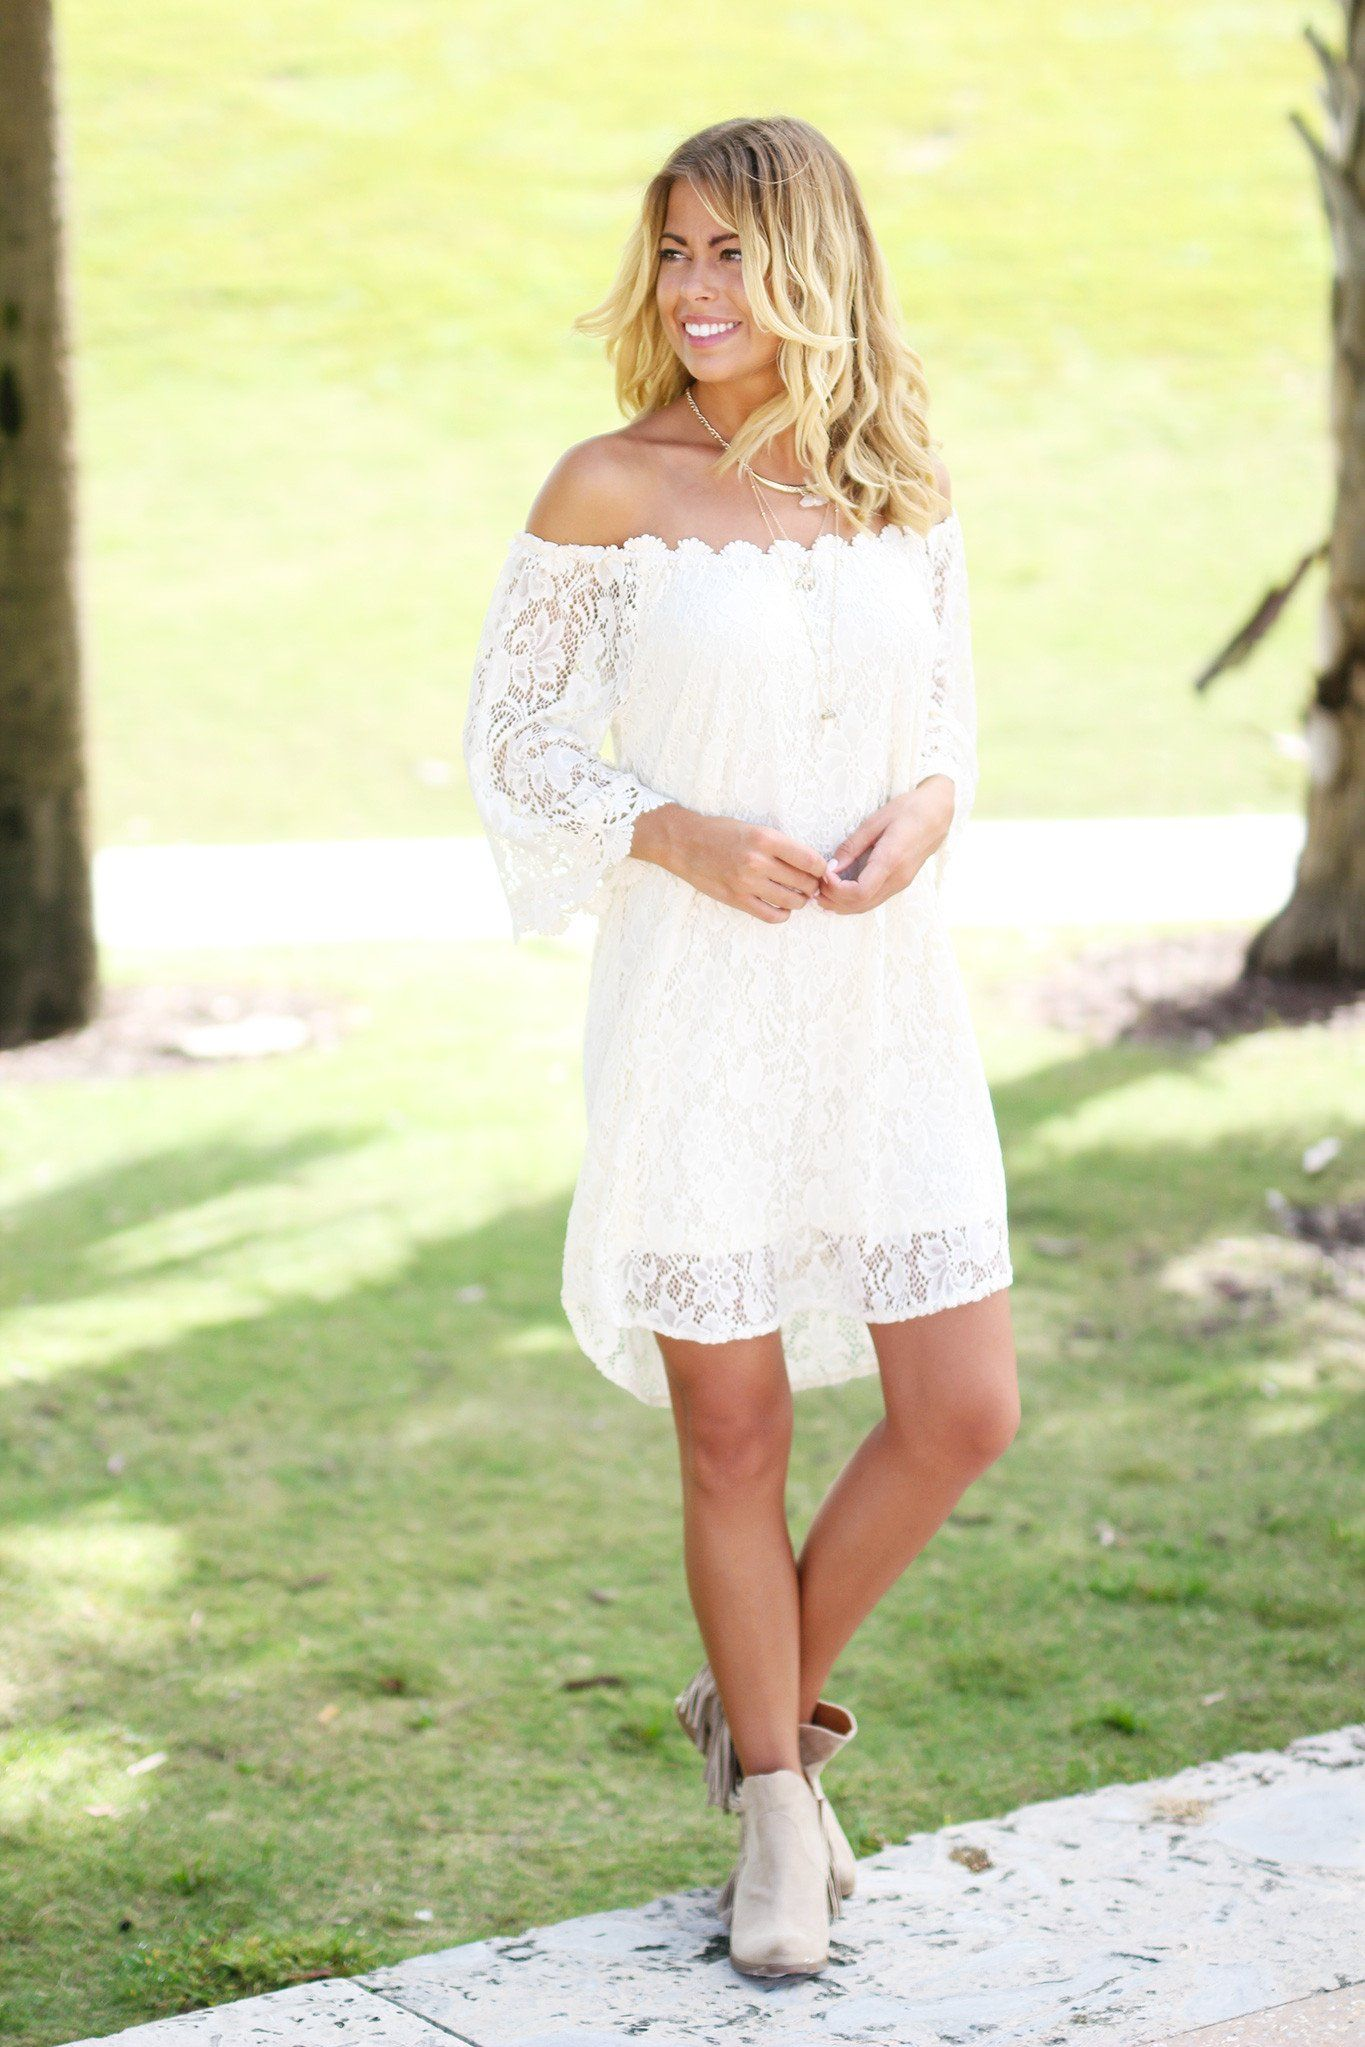 Cream Lace Off Shoulder Short Dress Bunk Bedswoodworking